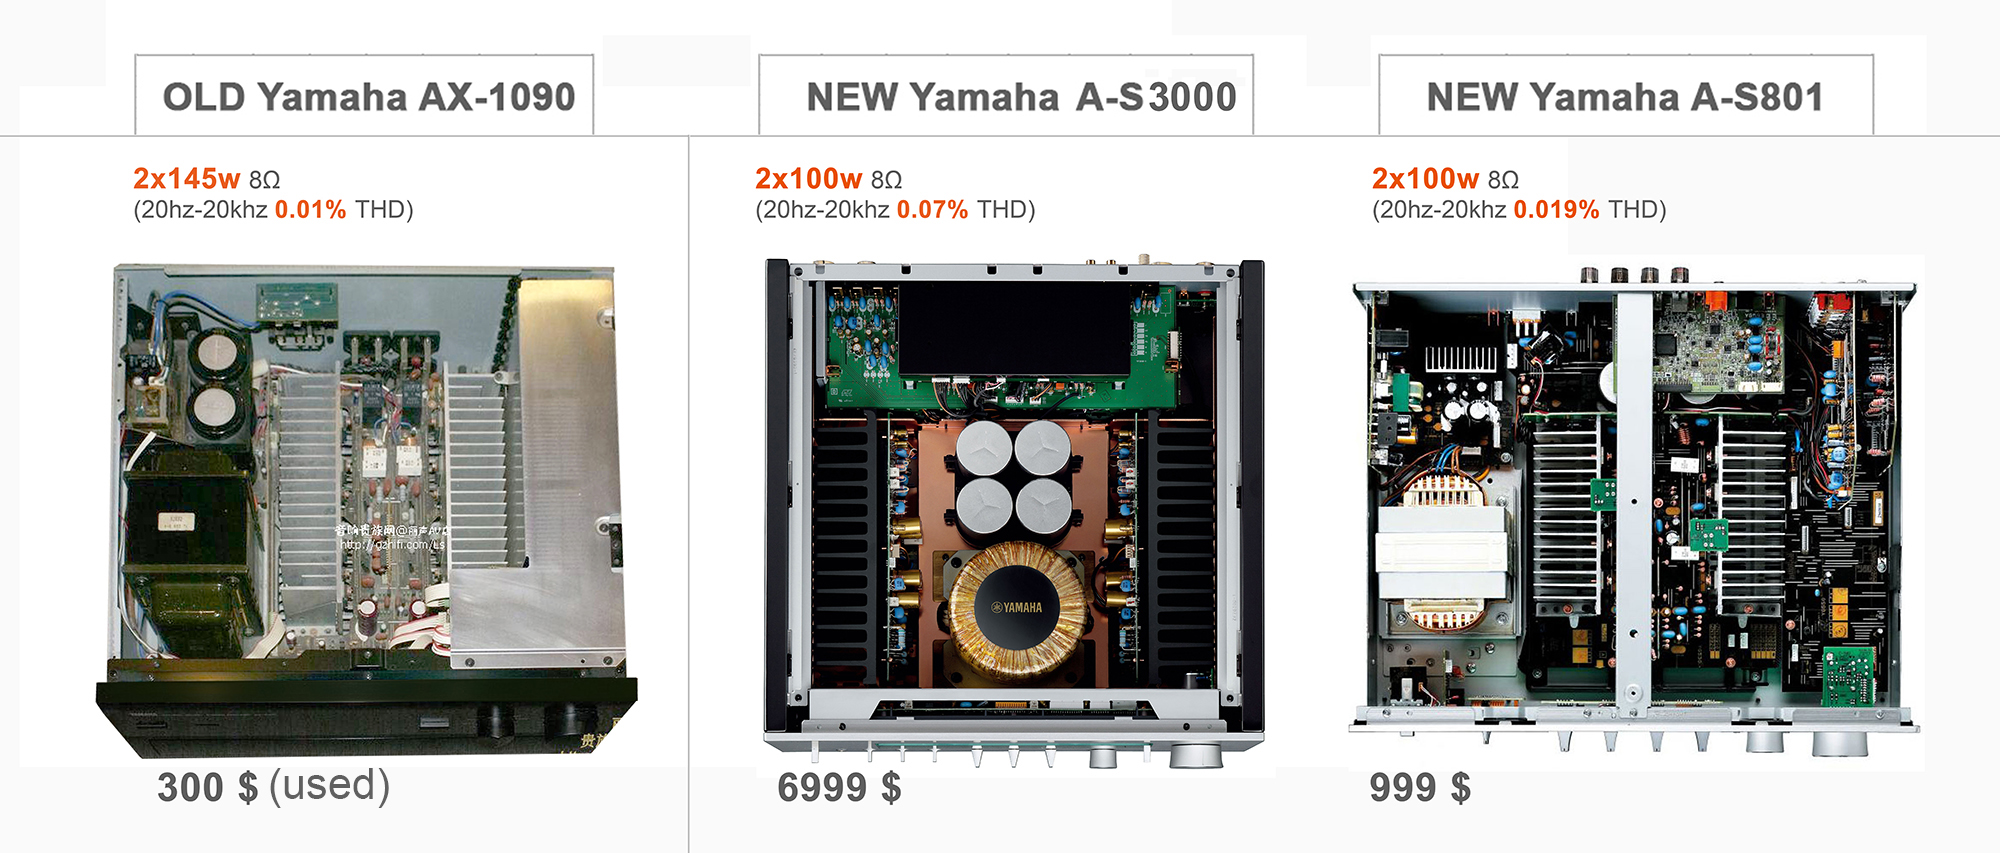 old amp vs new amp yamaha ax 1090 vs yamaha a s801. Black Bedroom Furniture Sets. Home Design Ideas